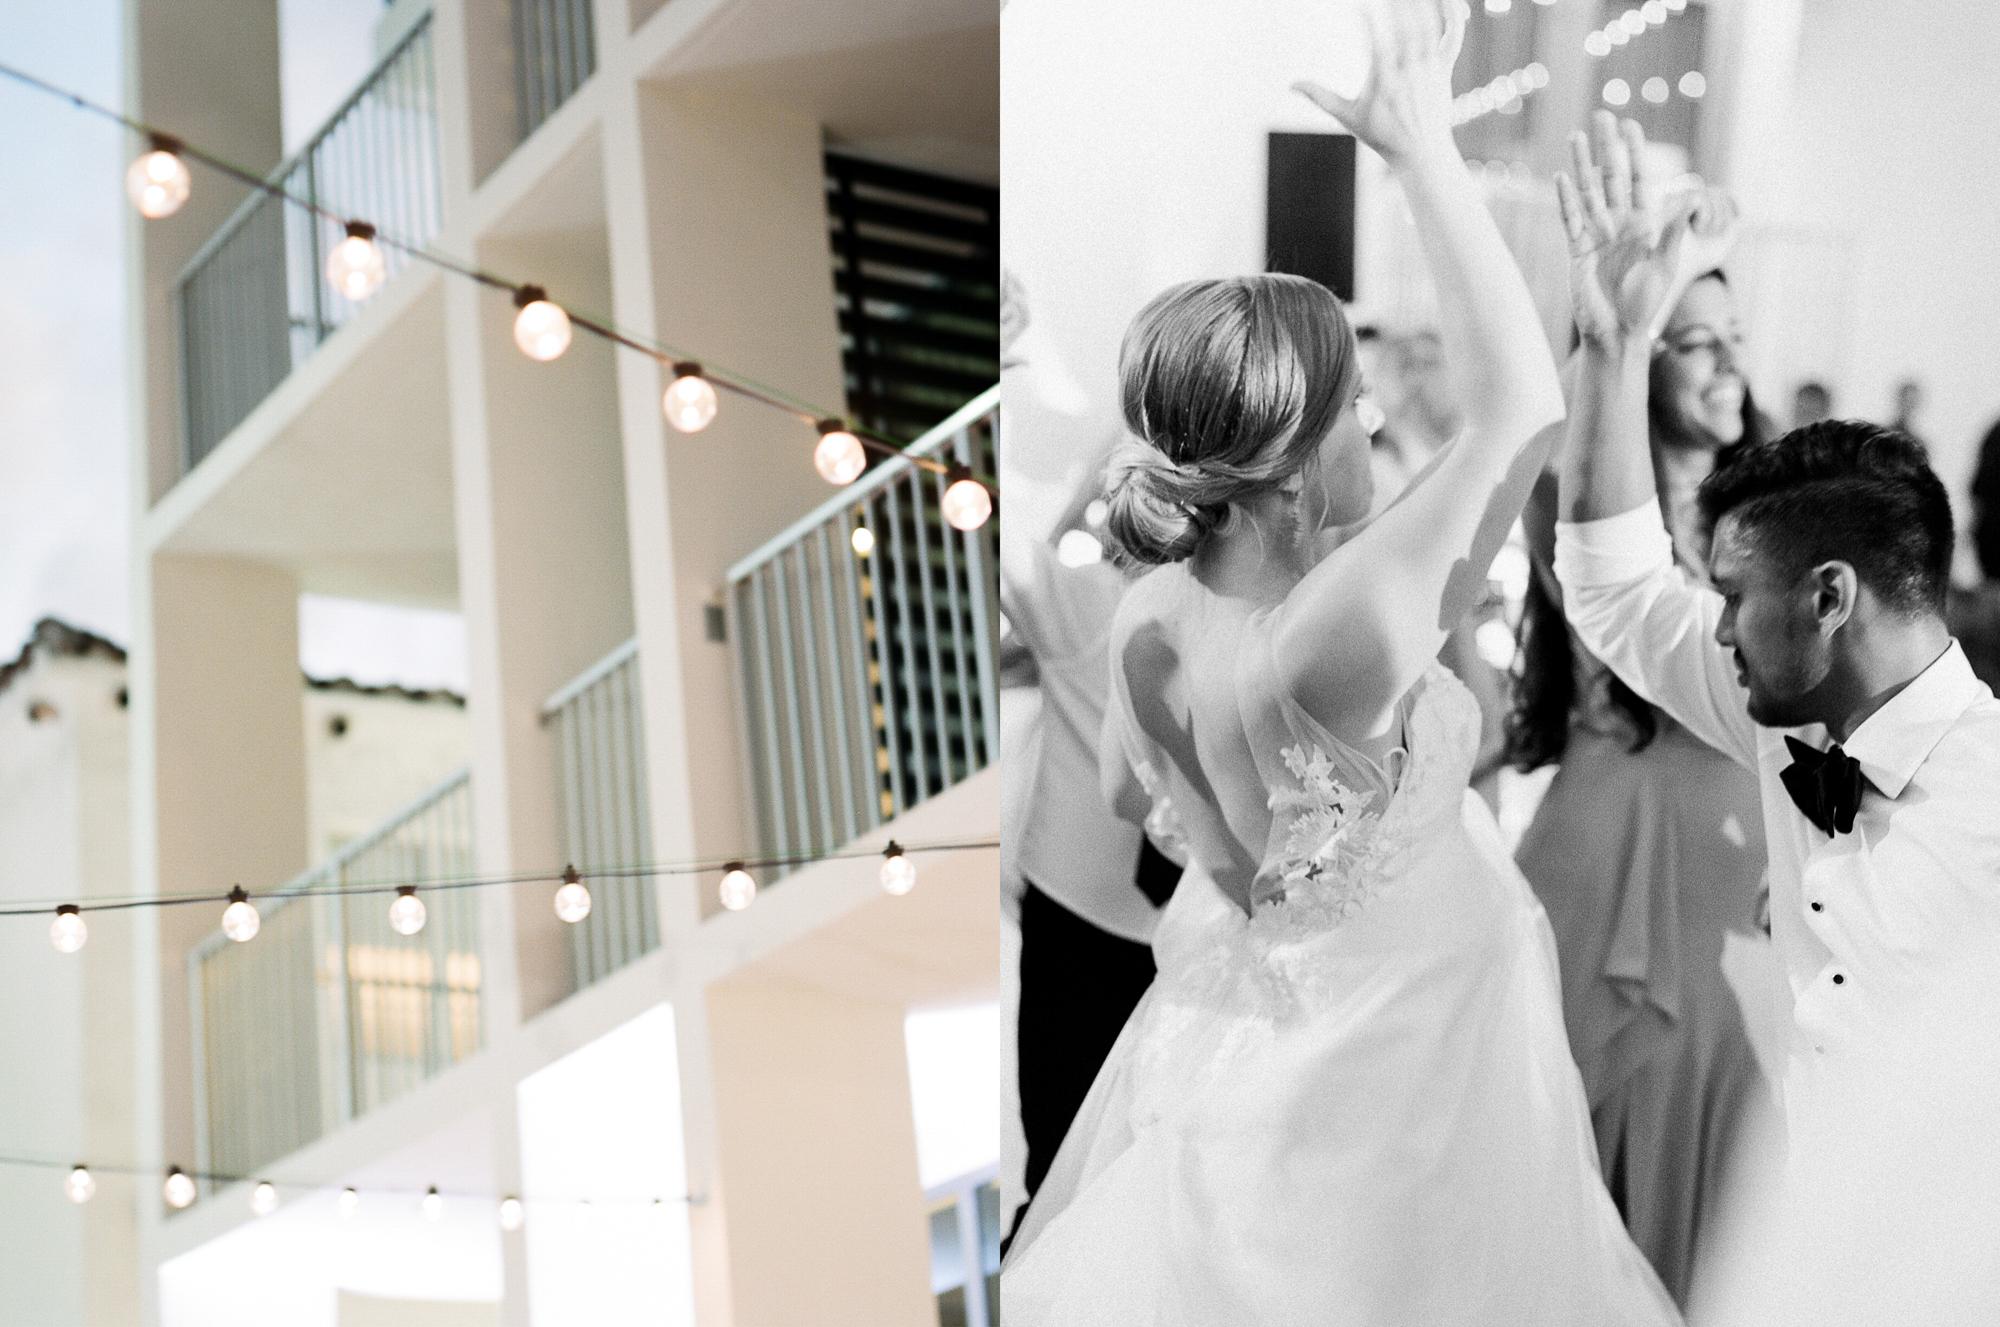 betsy-hotel-wedding-south-beach-miami-charleston-south-carolina-destination-wedding-photographer-37.jpg